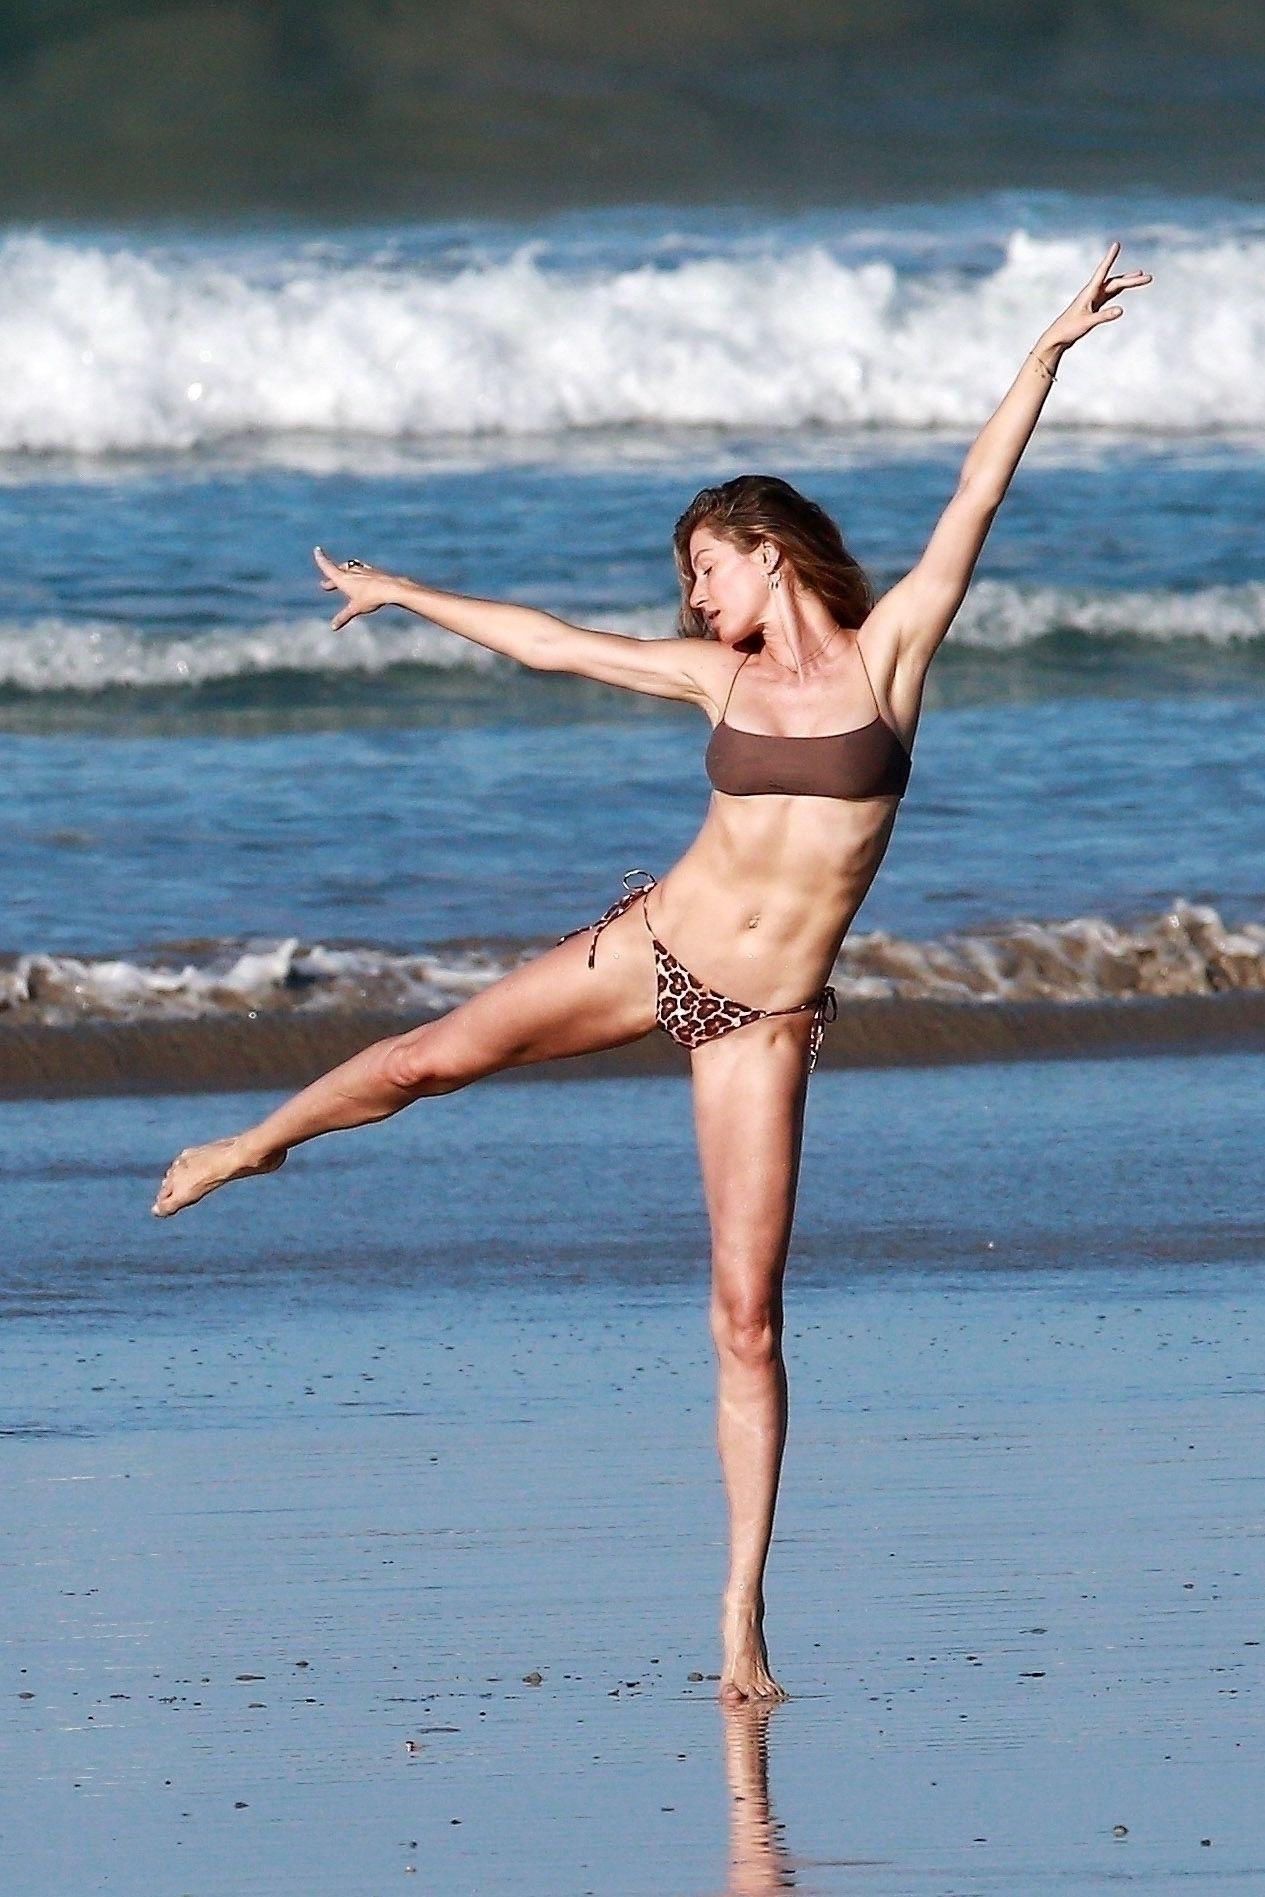 Gisele Bundchen Puts Her Incredible Bikini Body On Display During A Beach Photoshoot 0015